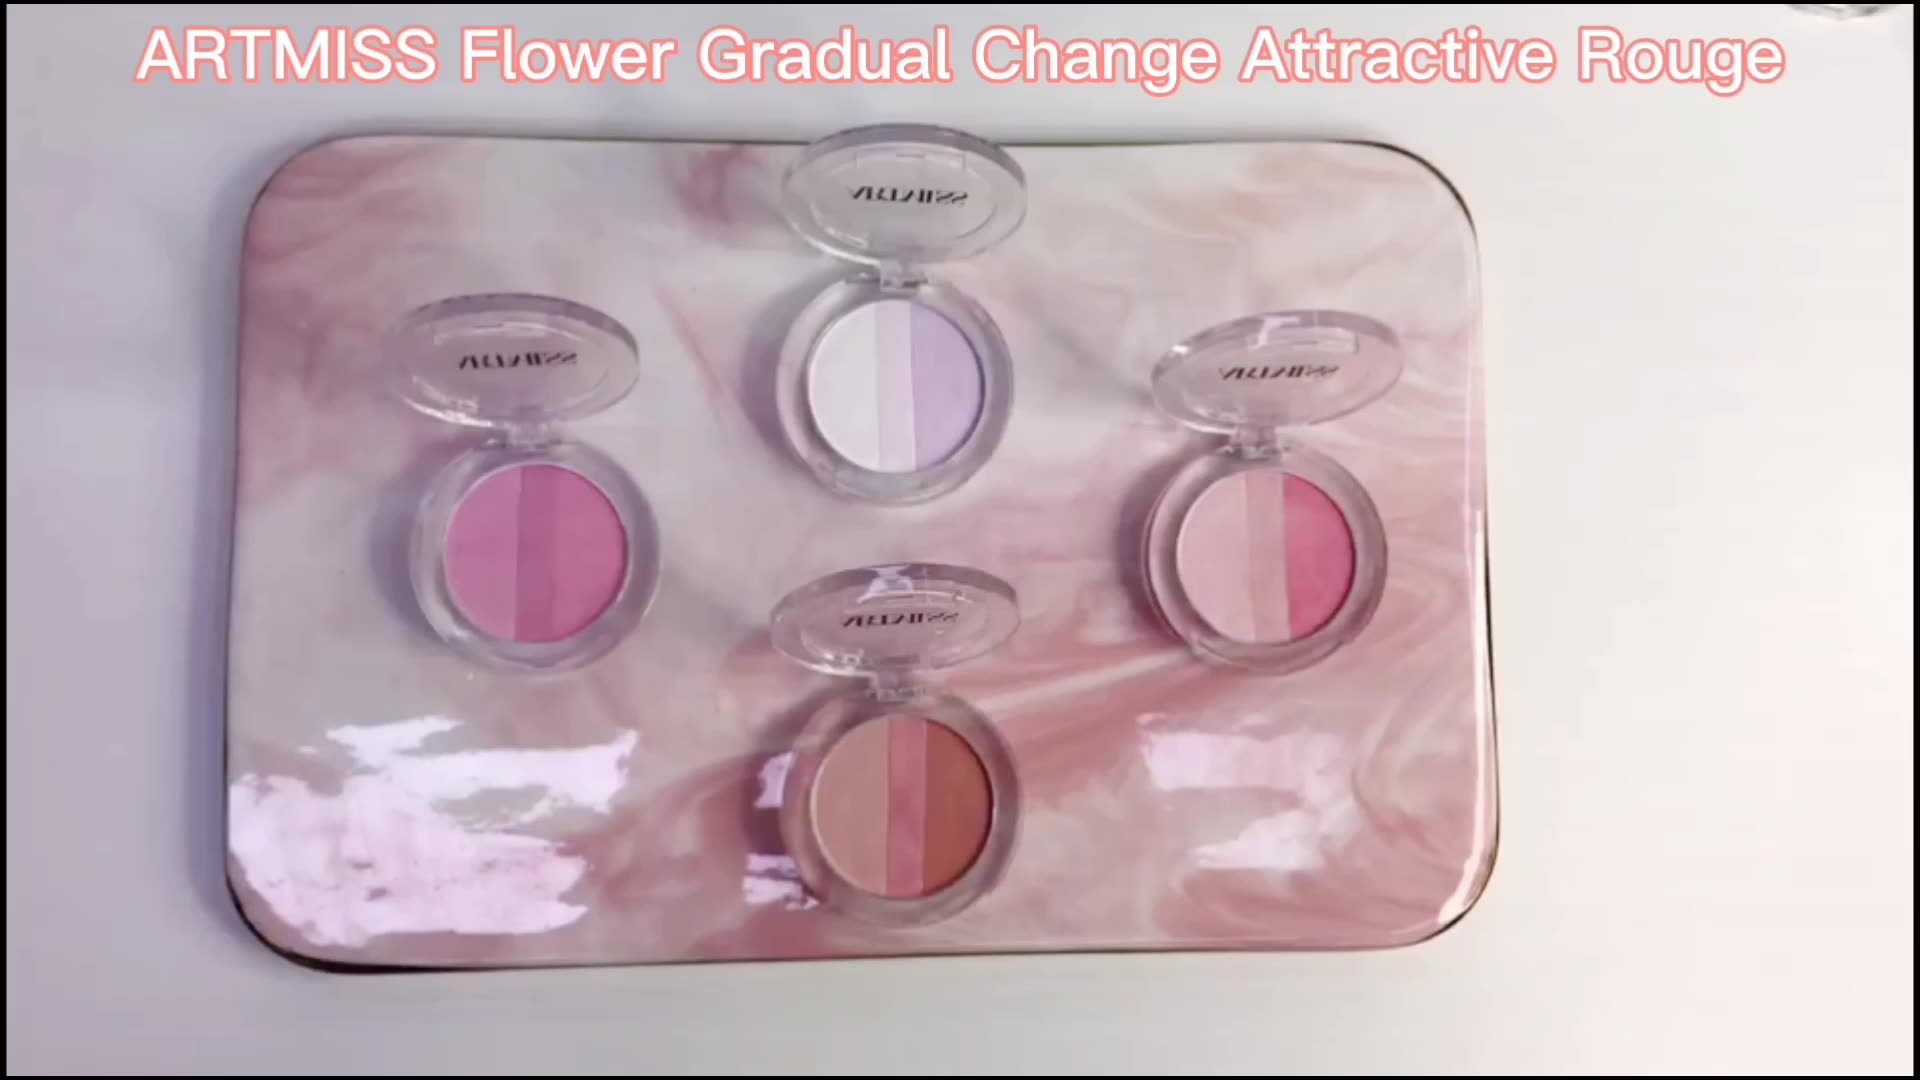 ARTMISS Hot selling Cheek Makeup Highlight Rouge Cosmetics 4 Color Blush Powder Blusher